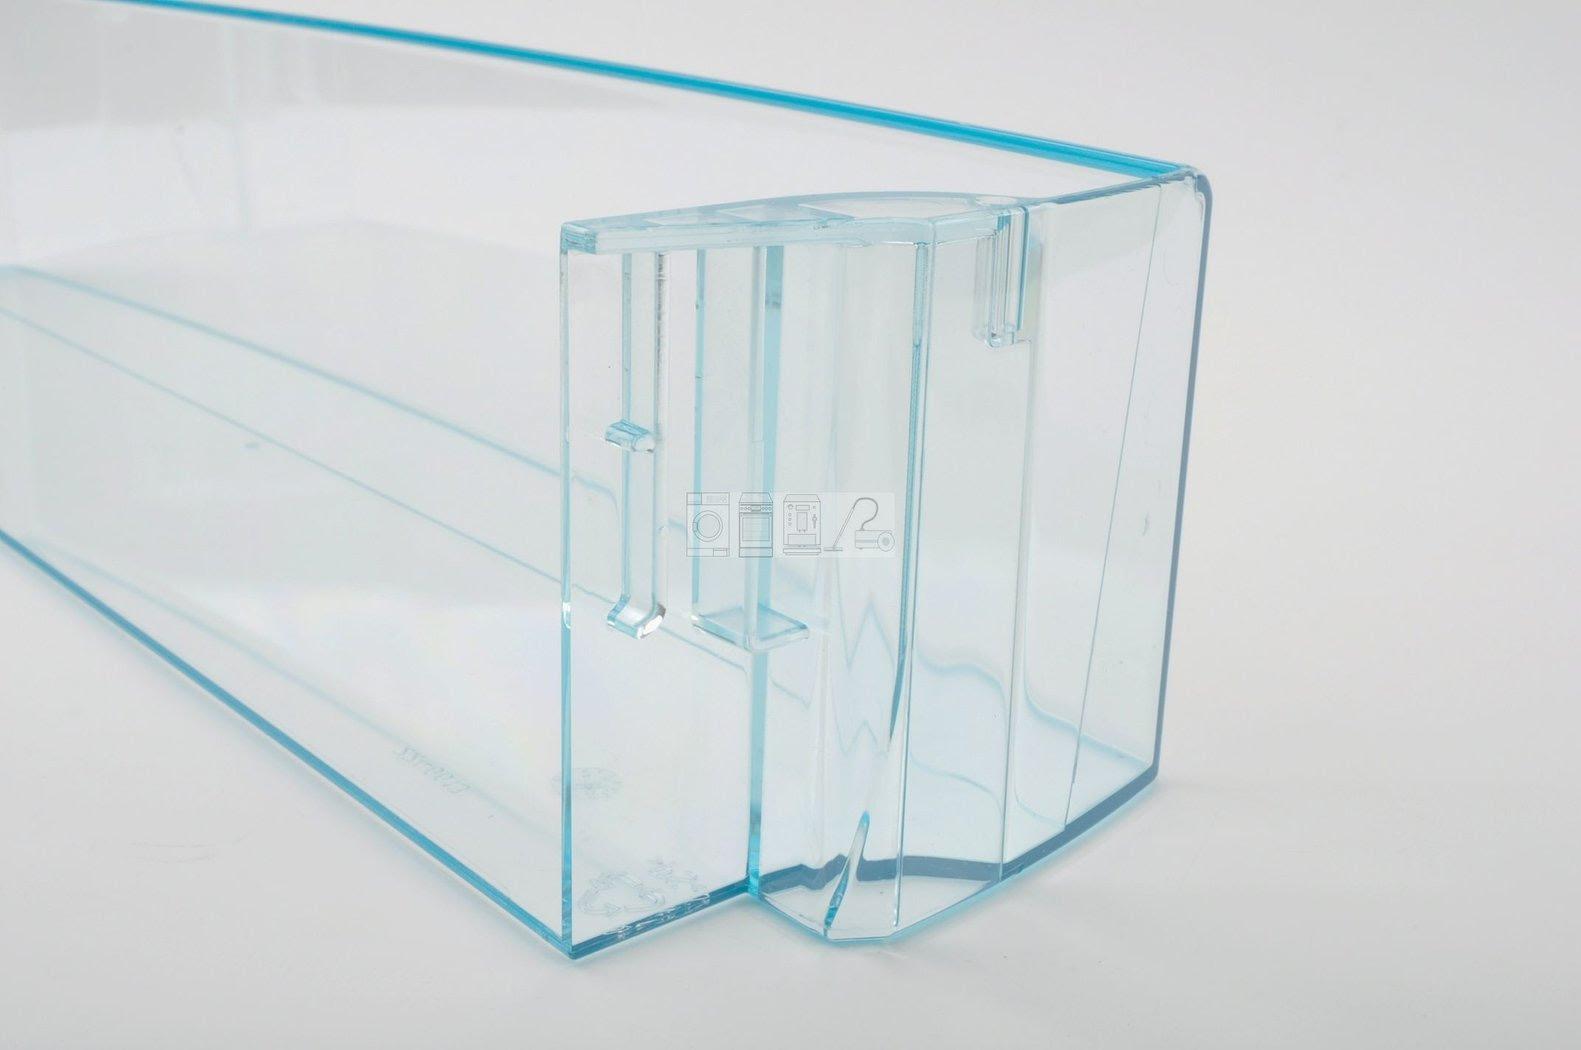 Gorenje Kühlschrank Macht Komische Geräusche : Kühlschrank blubbert laut rachael haugh